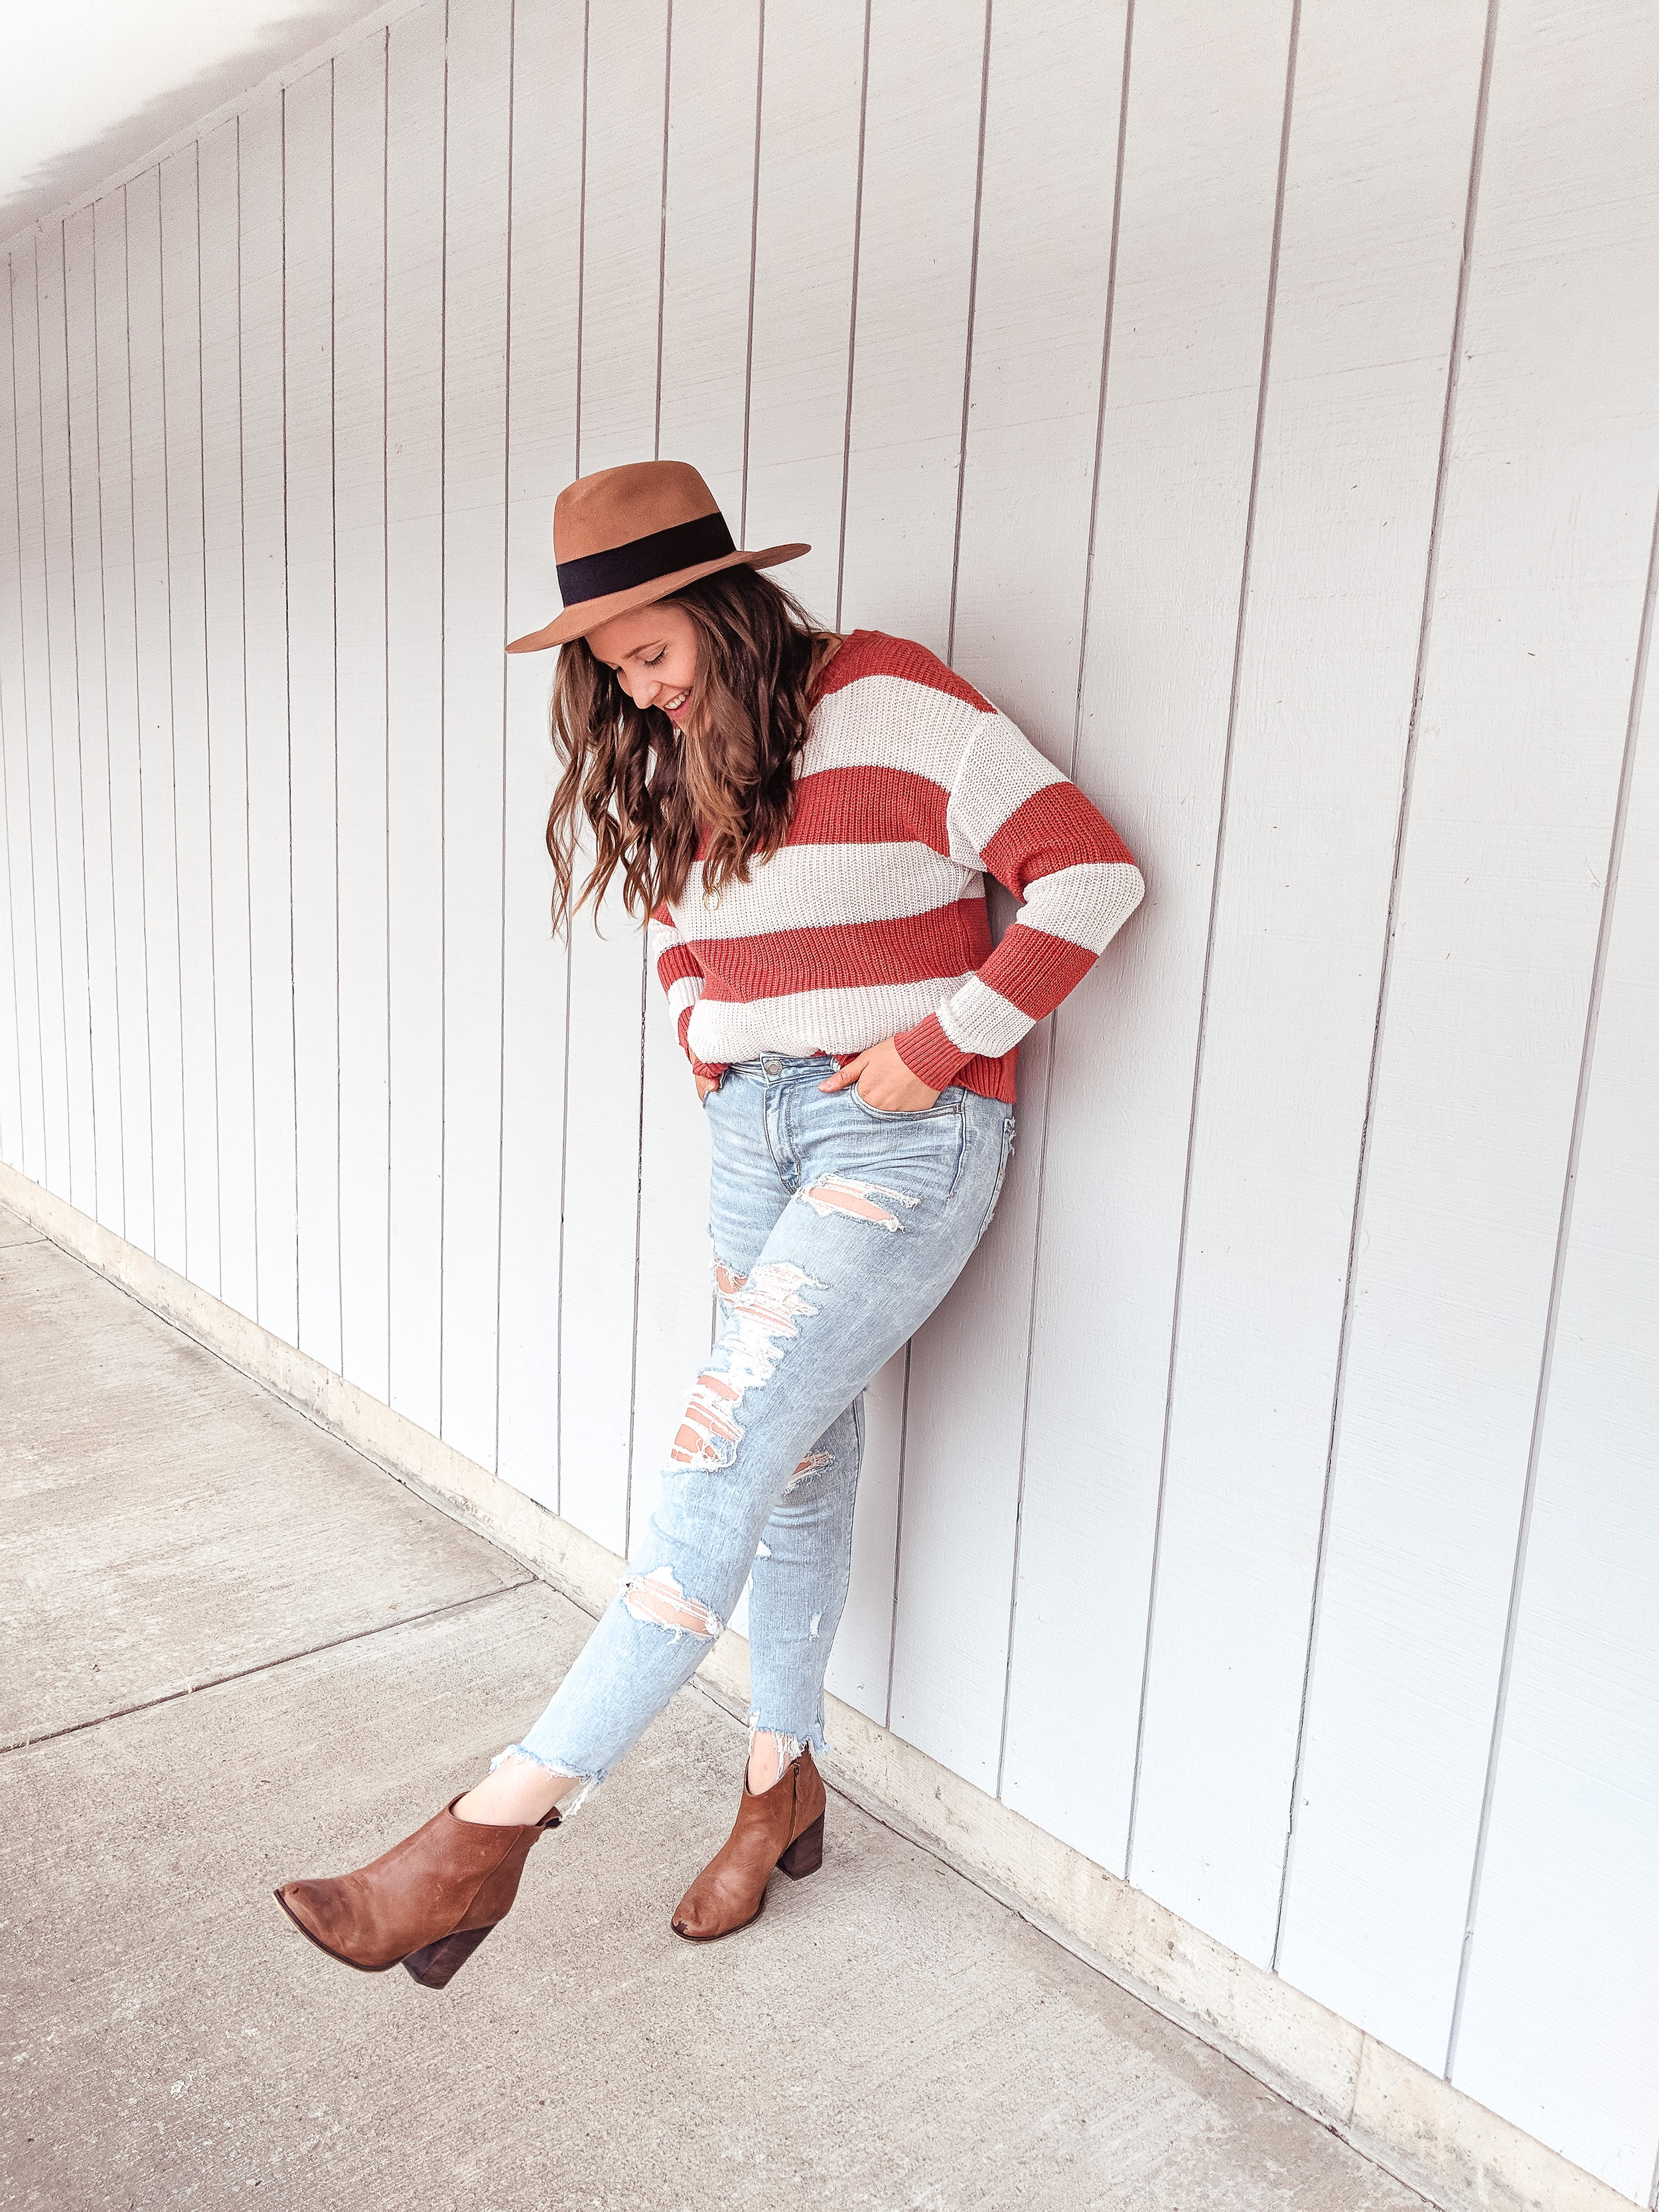 Fall Fashion with AE StylebyJulianne